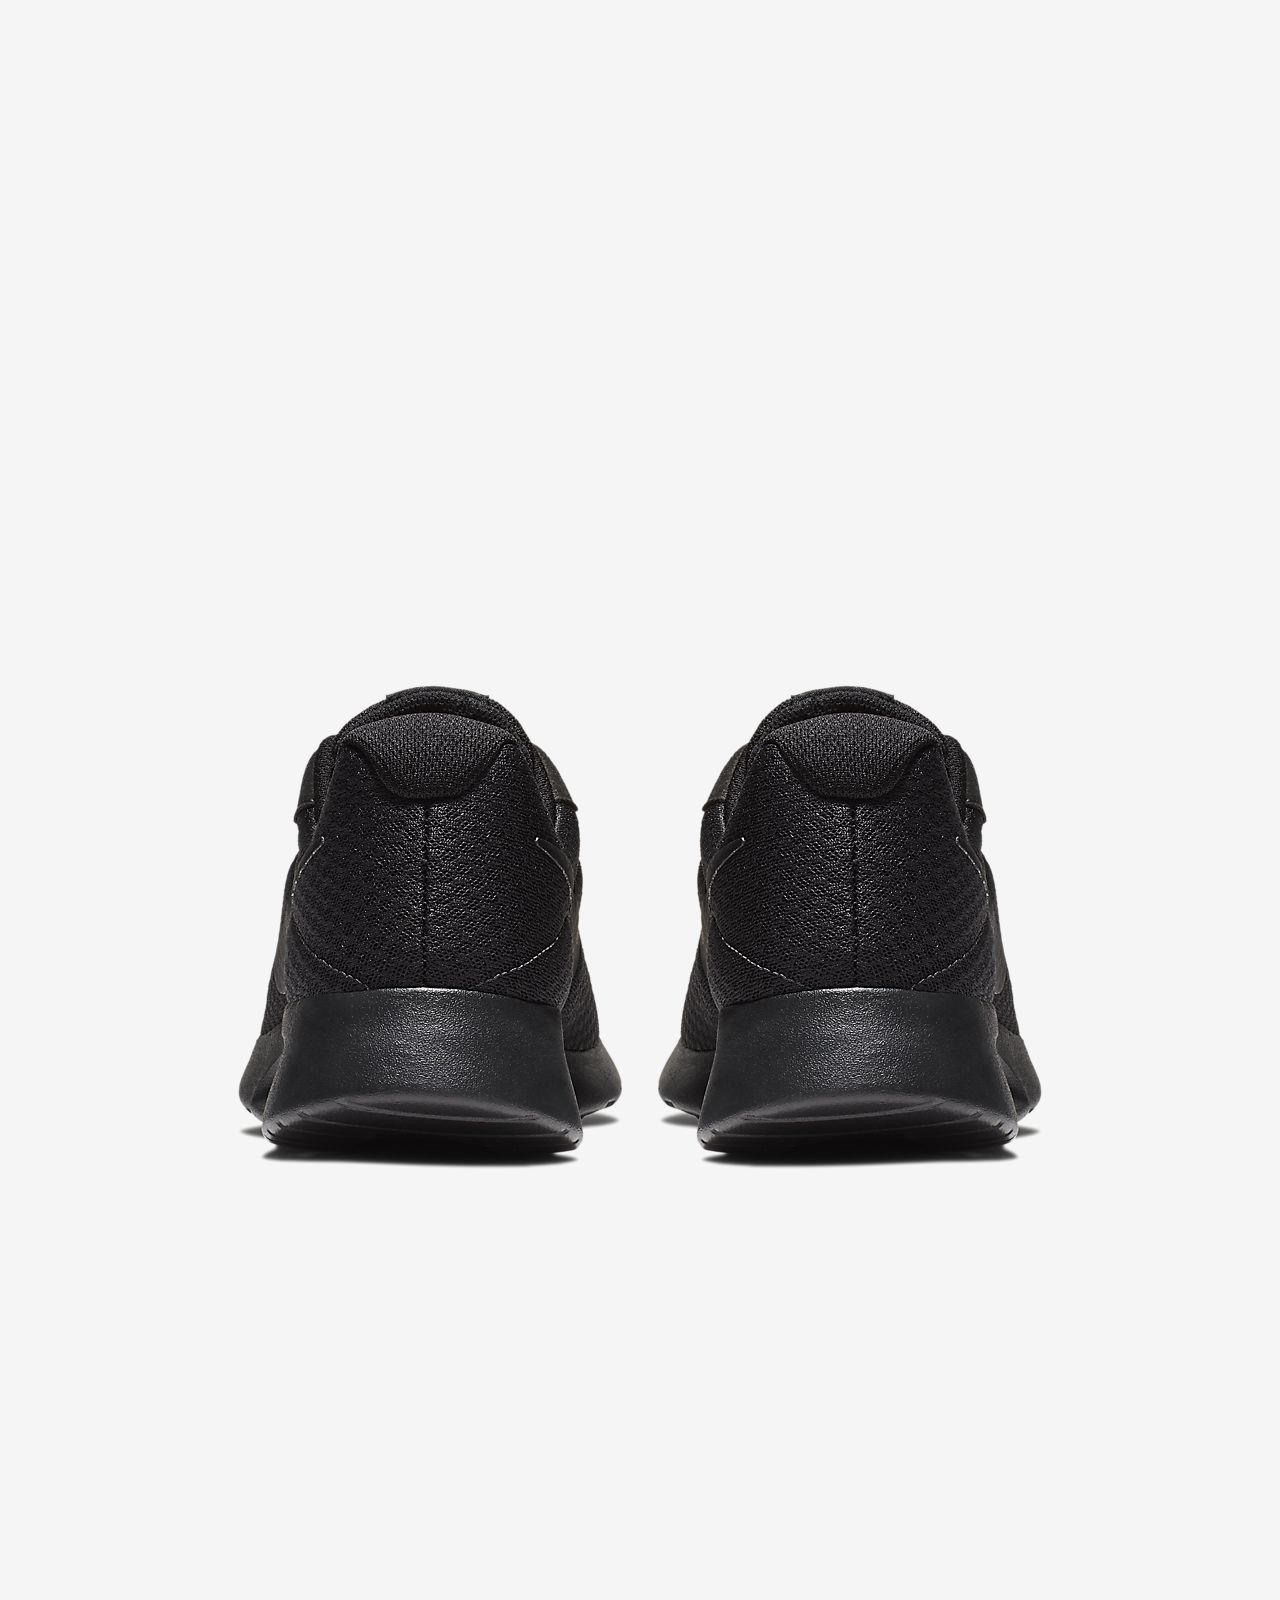 Nike Tanjun Tanjun Tanjun Herrenschuh Sparen Sie über 50%-AR1845DS      Sale Online Shop  4ace7c